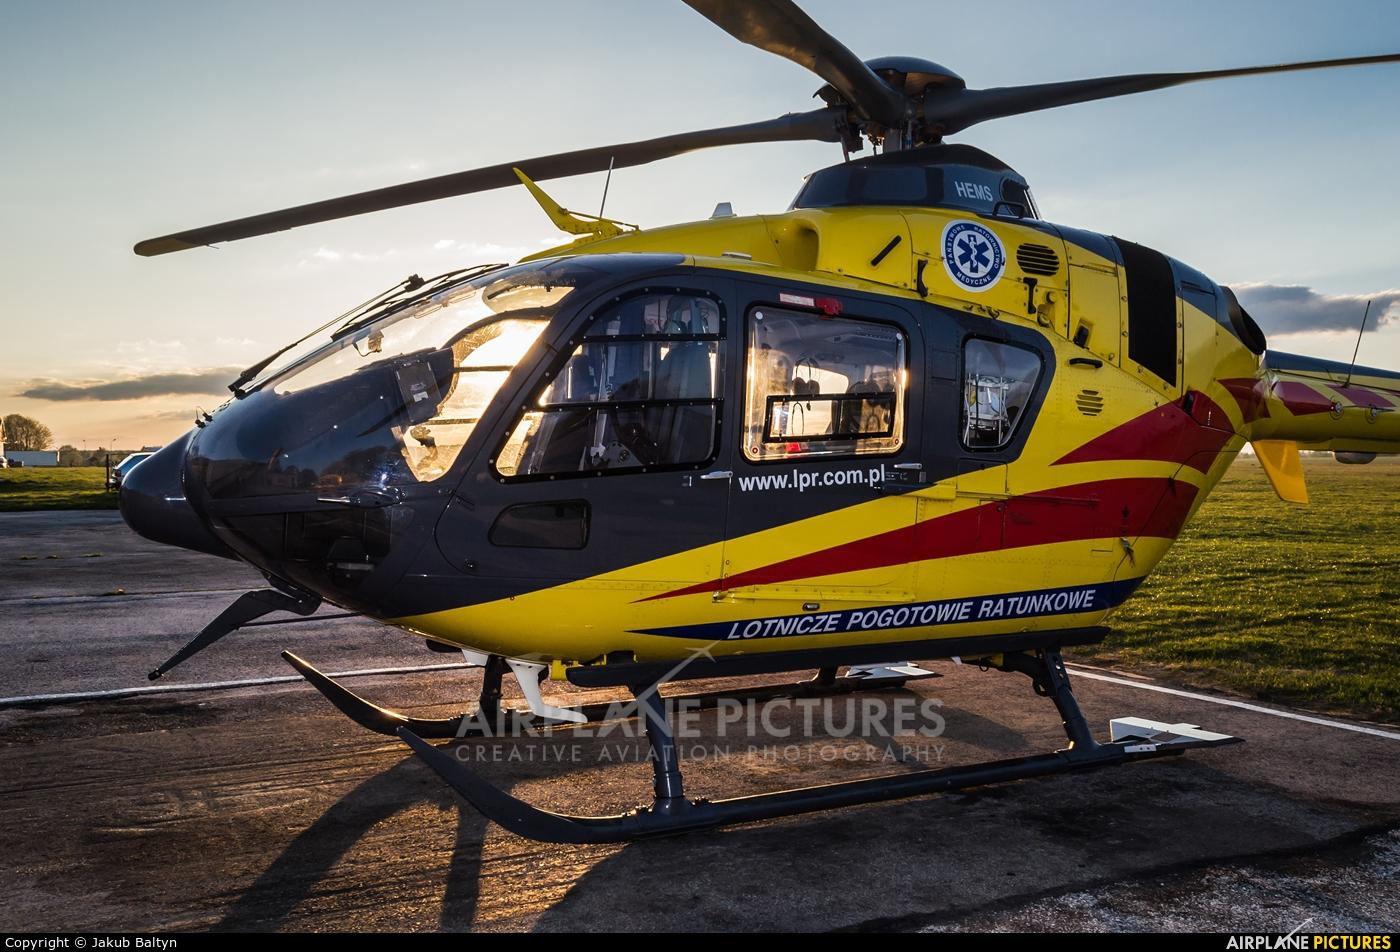 �hxz_SP-HXZ-PolishMedicalAirRescue-LotniczePogotowieRatunkoweEurocopterEC135